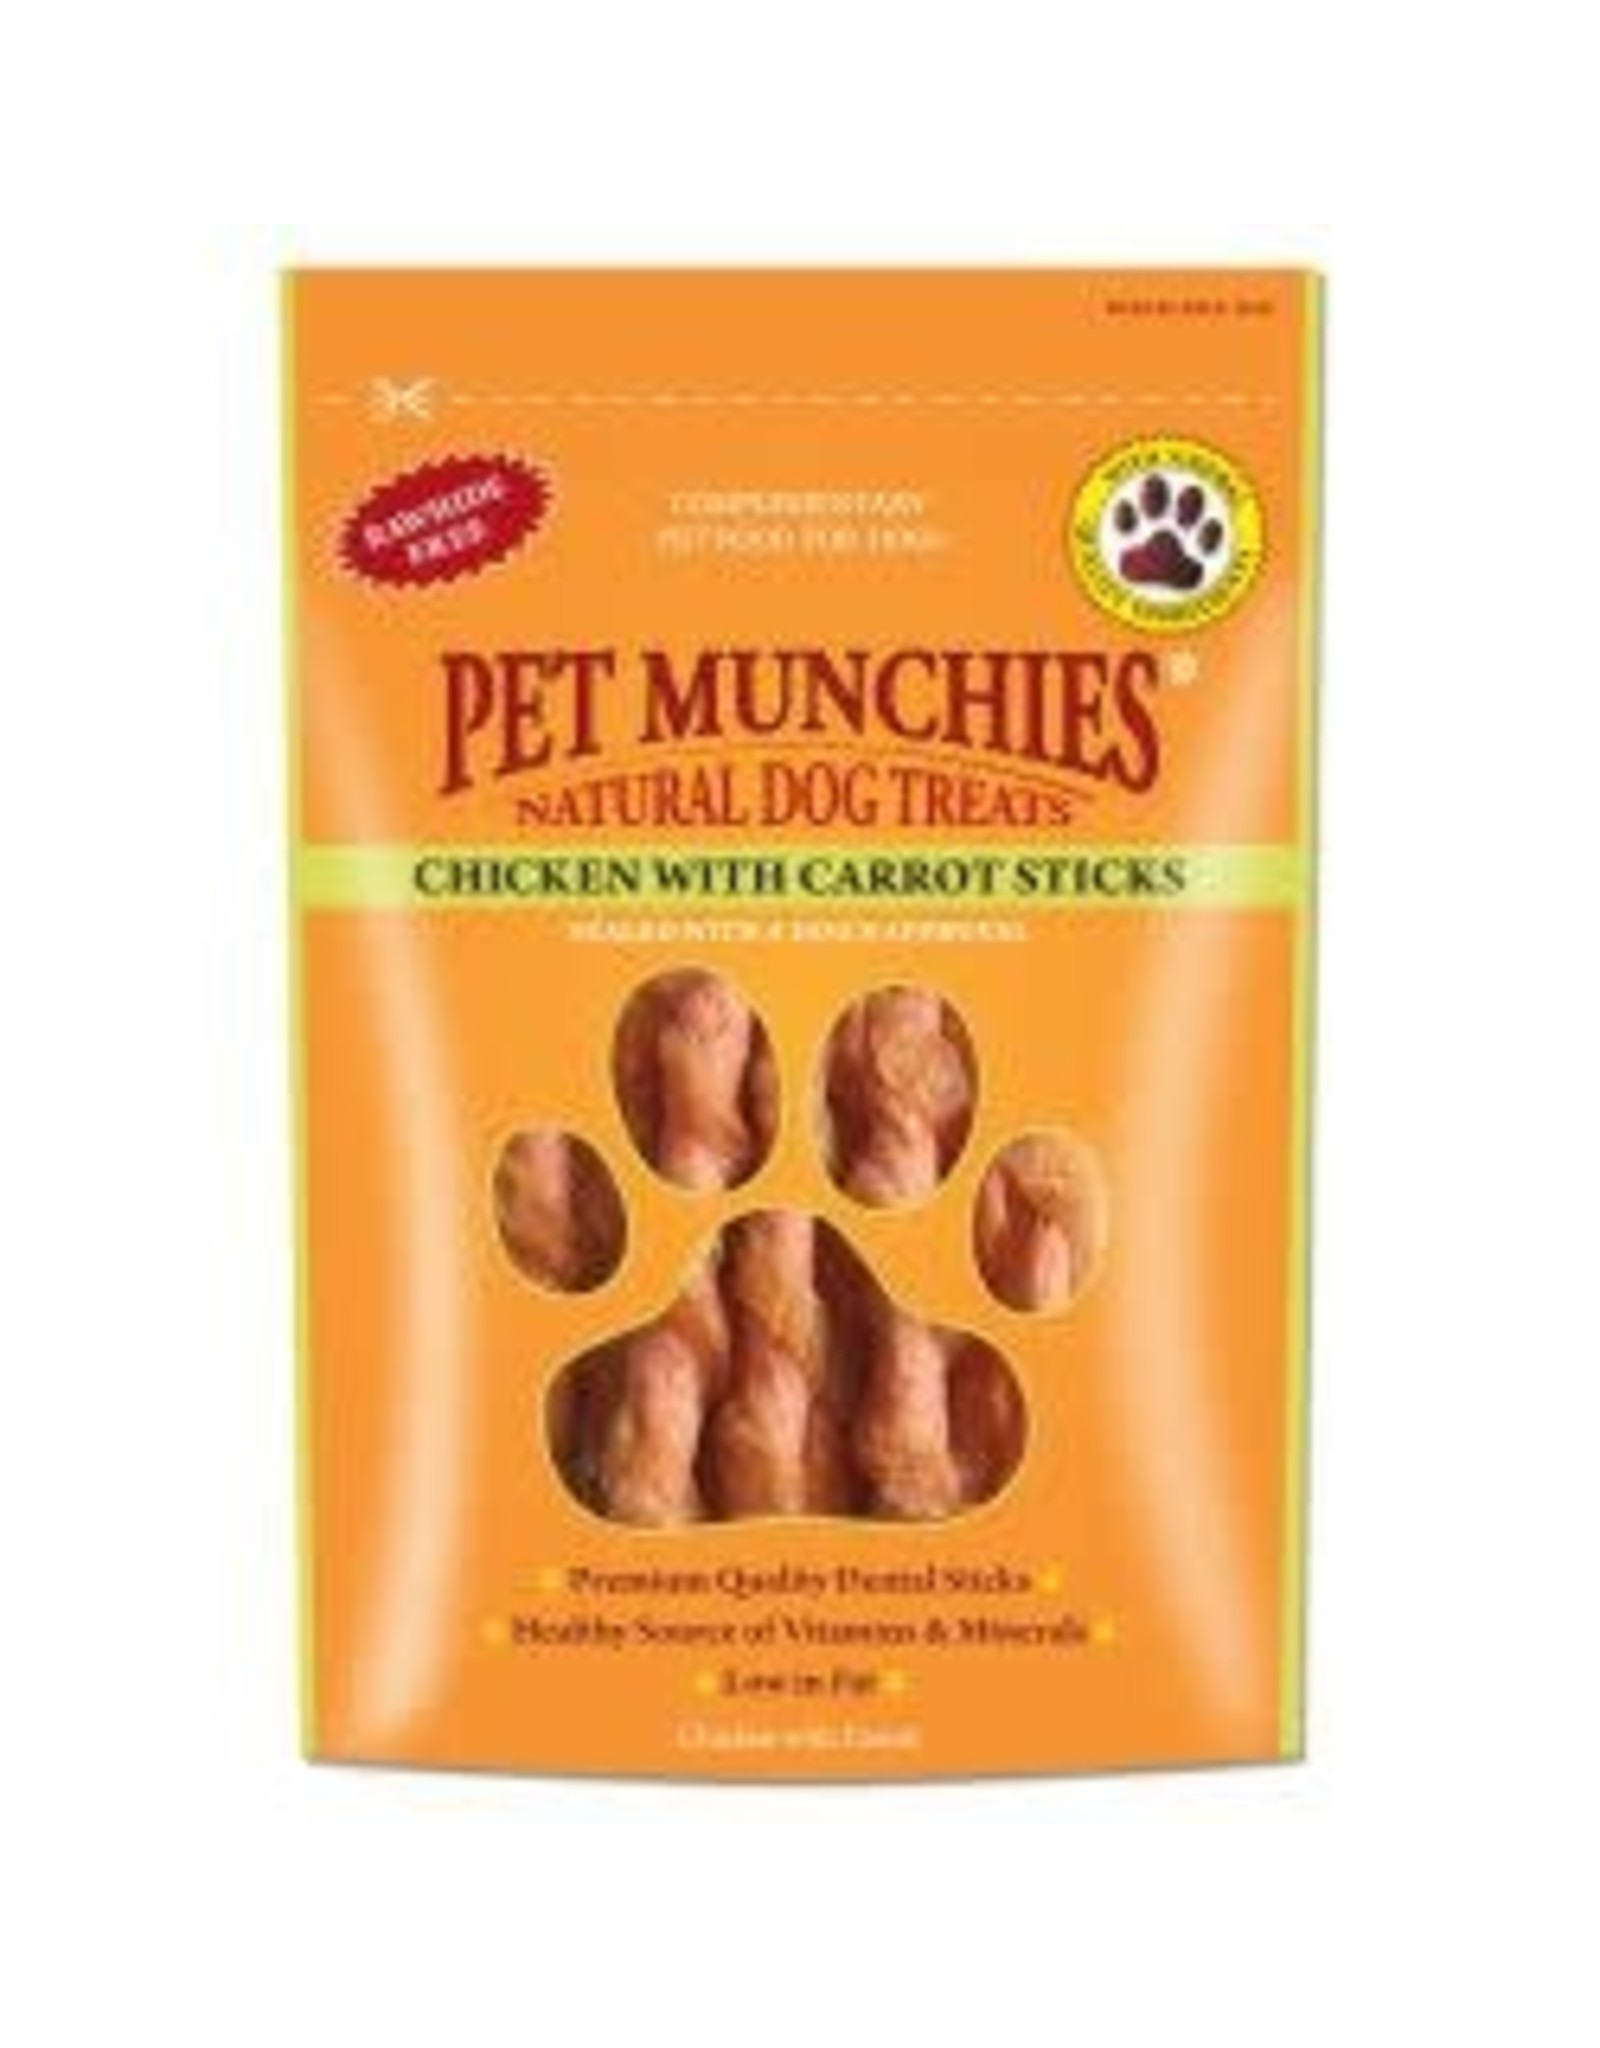 Pet Munchies Pet Munchies Chicken With Carrot Sticks 80g